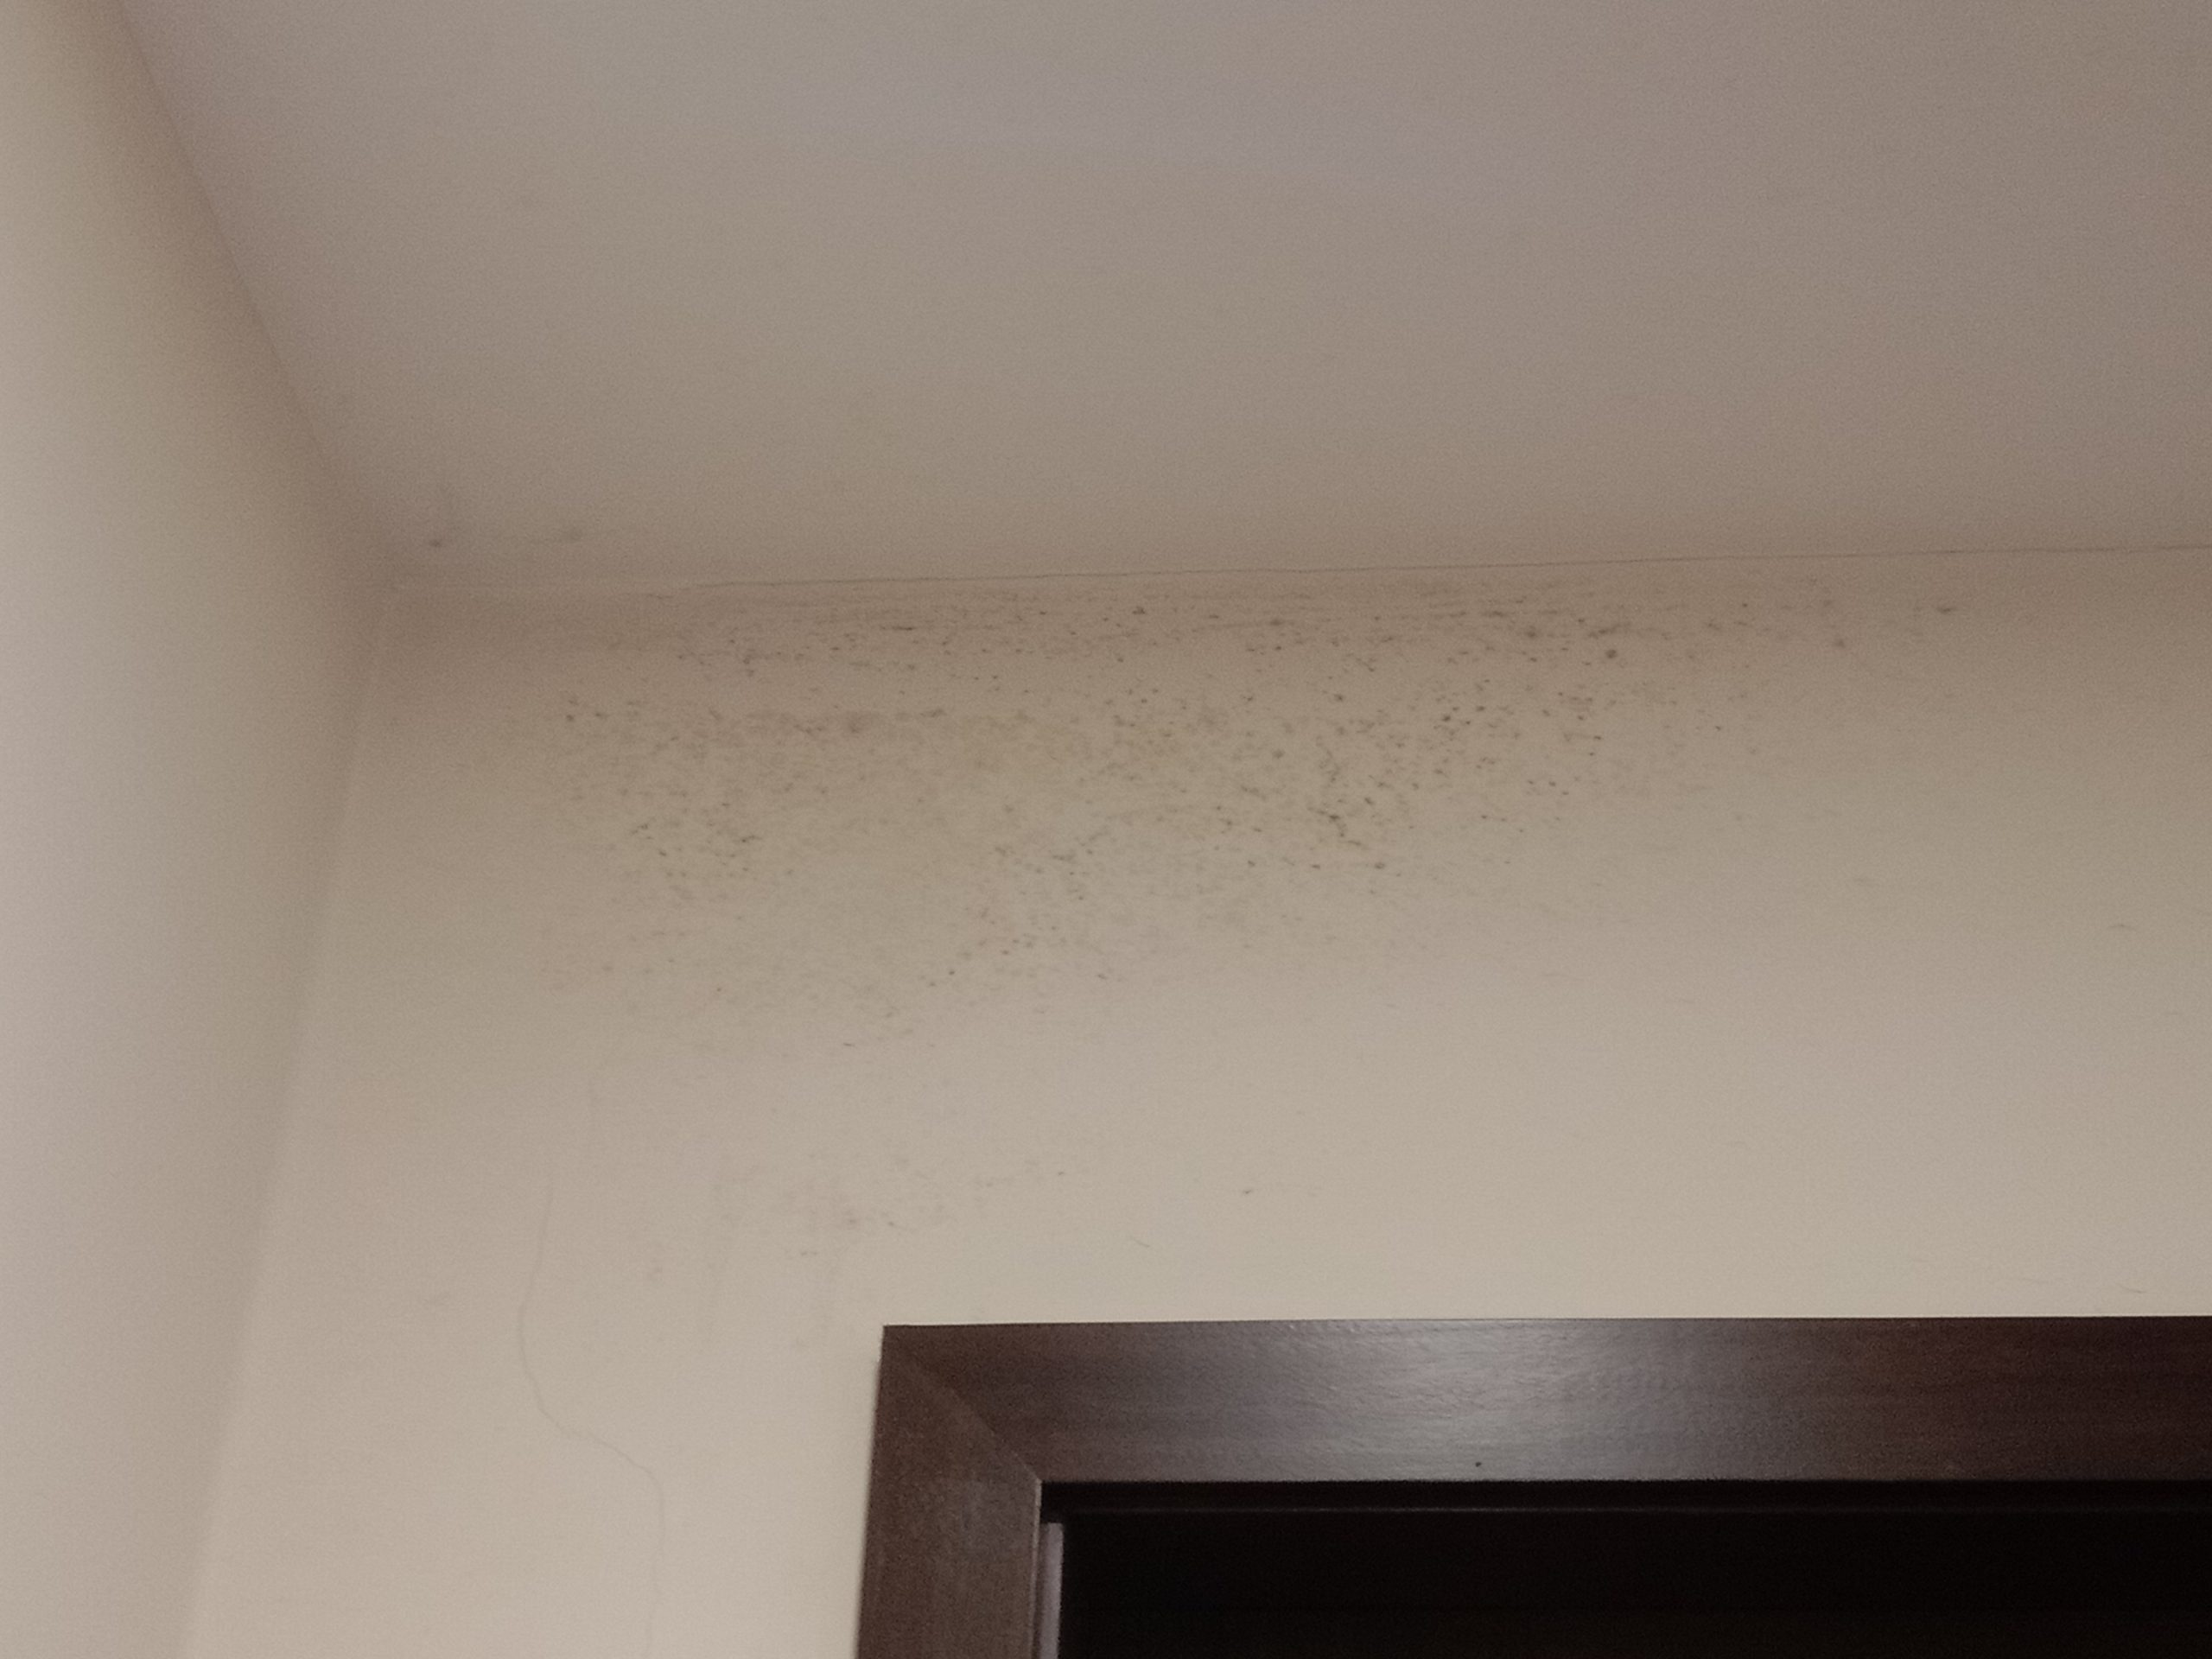 mold and spores